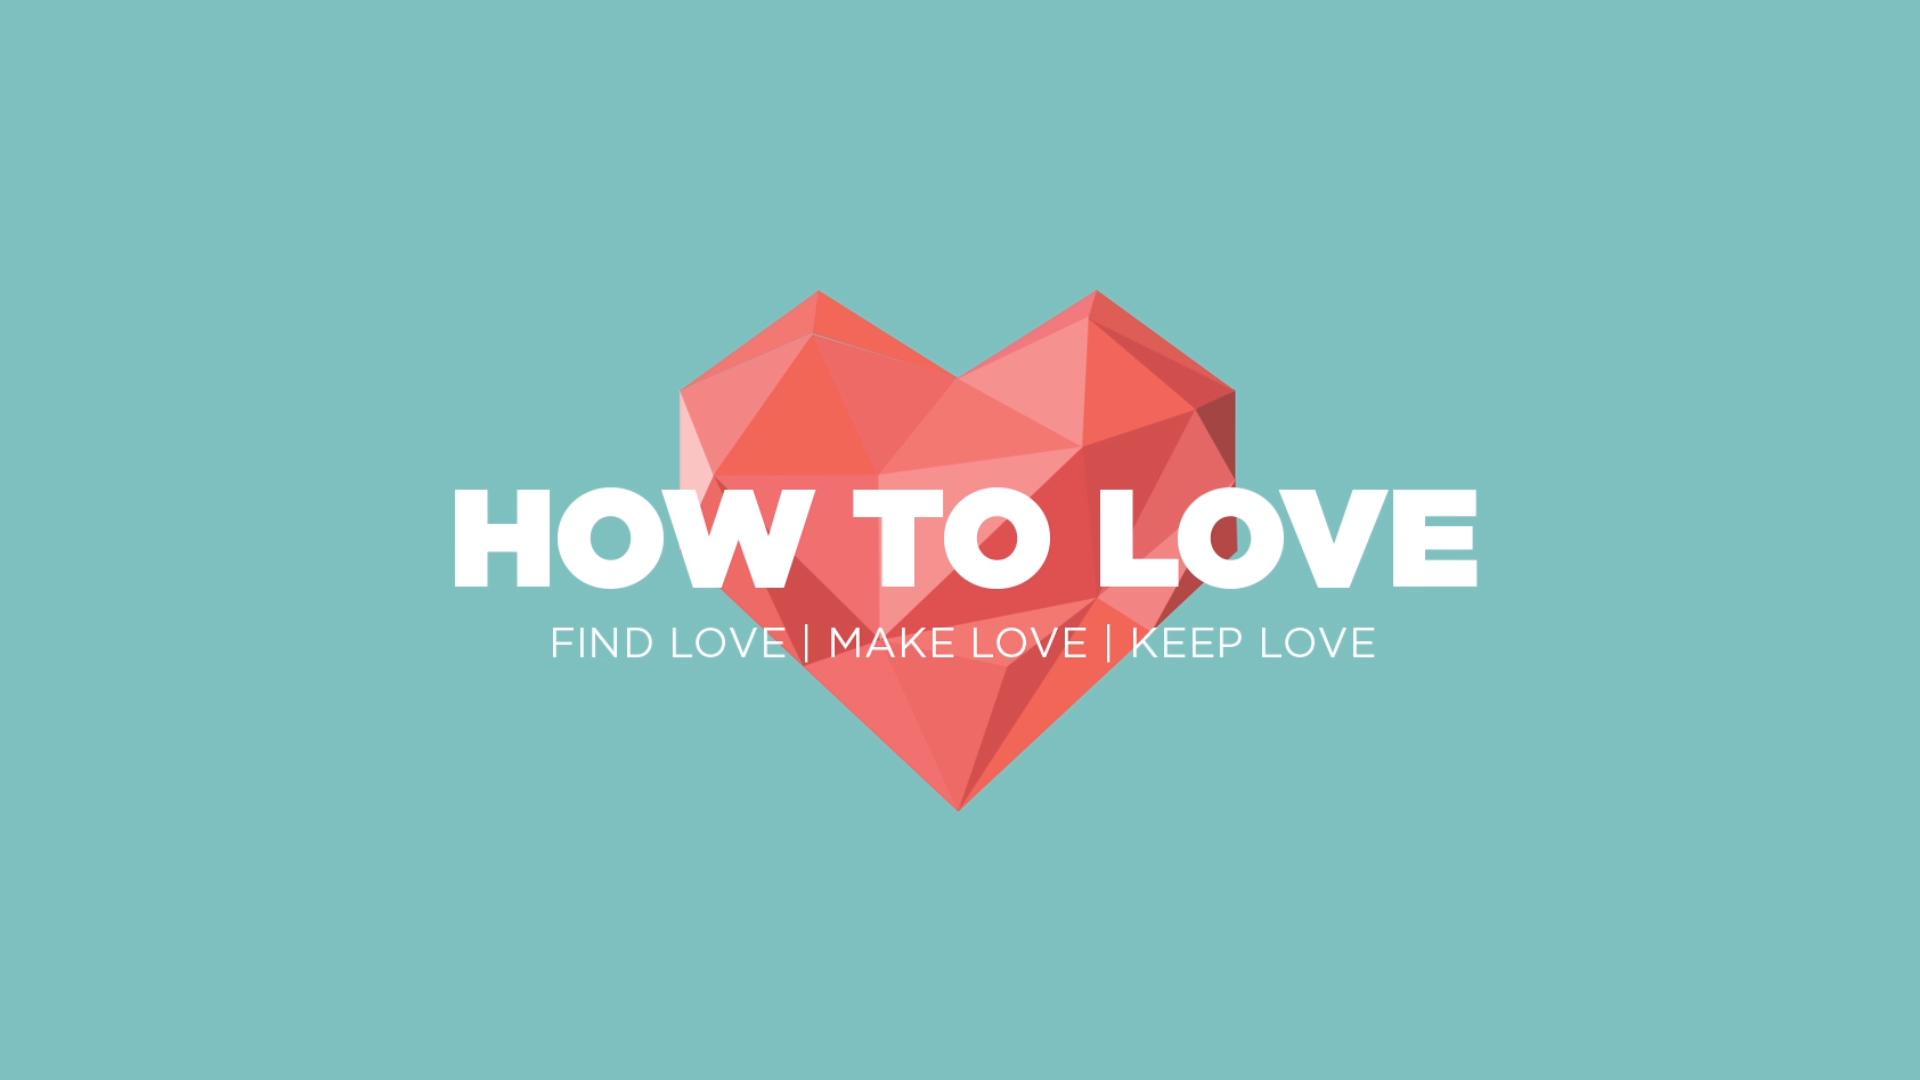 How To Love Roll In.00_00_11_00.Still001.jpg